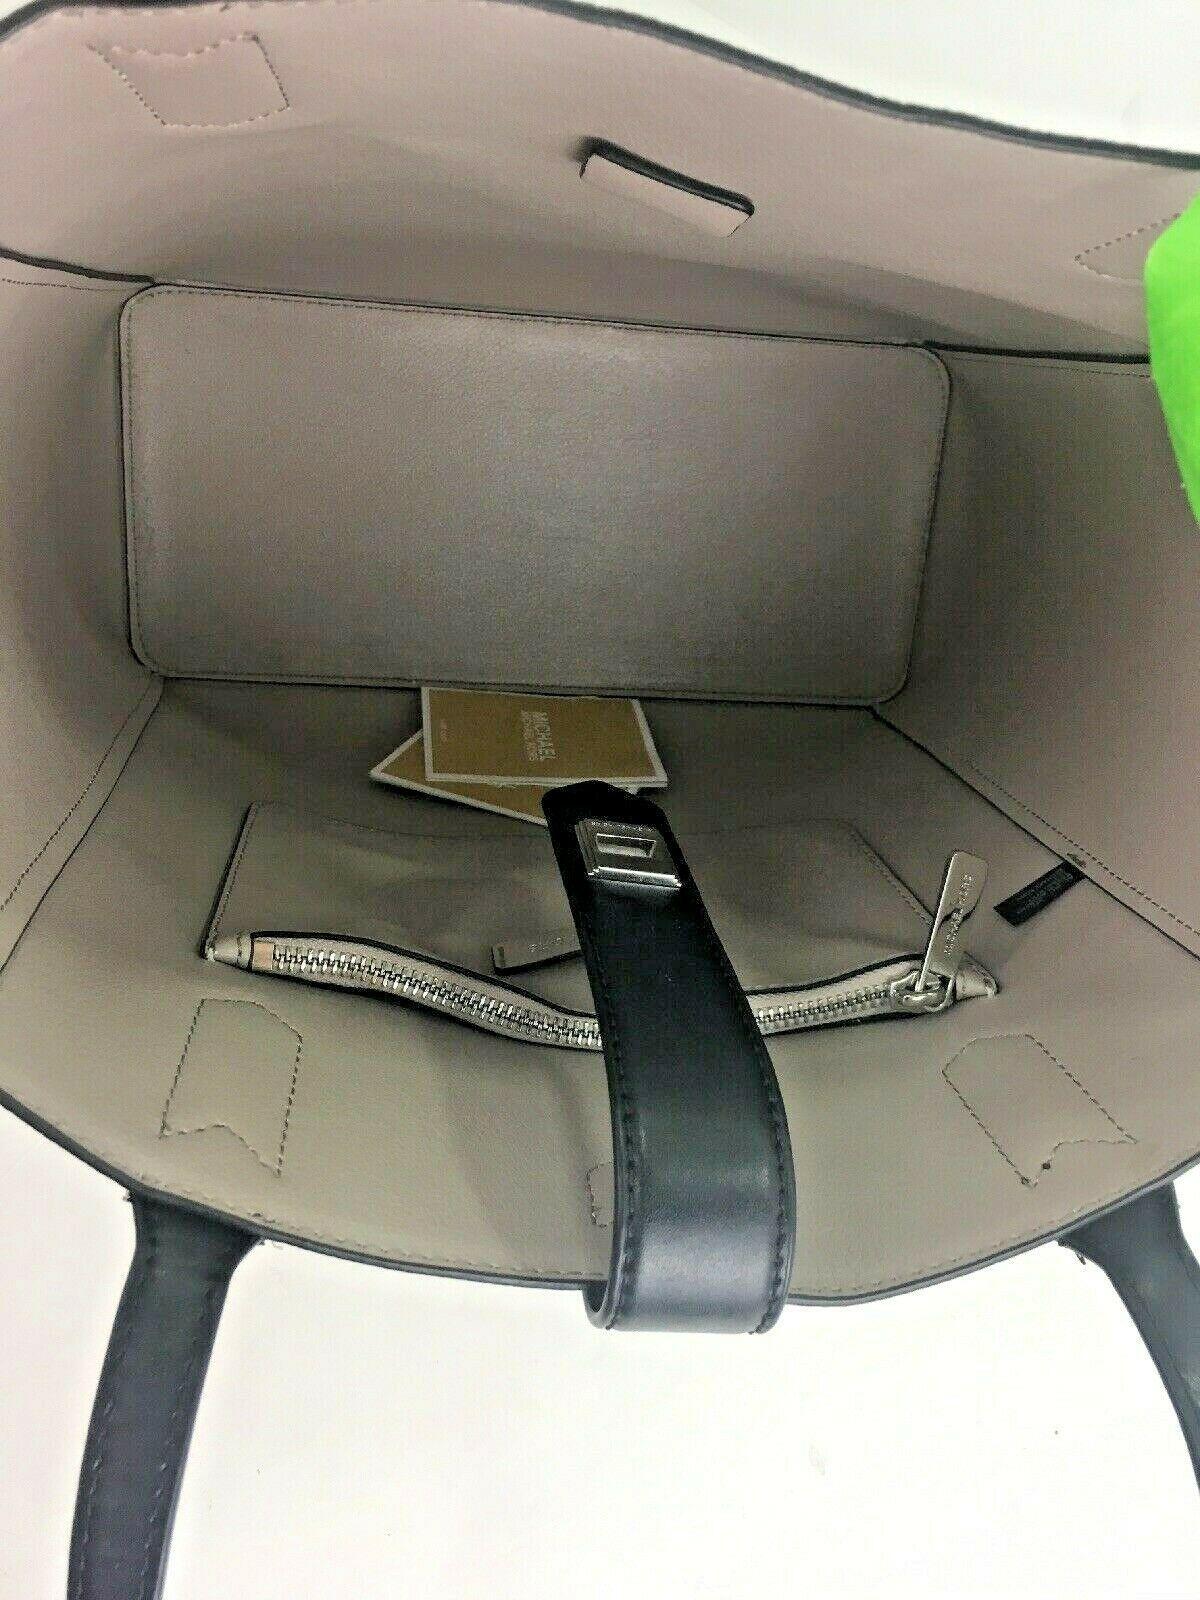 Michael Kors Bag Cassie Tote Medium NS Tote Leather White Gray Black B2R image 10